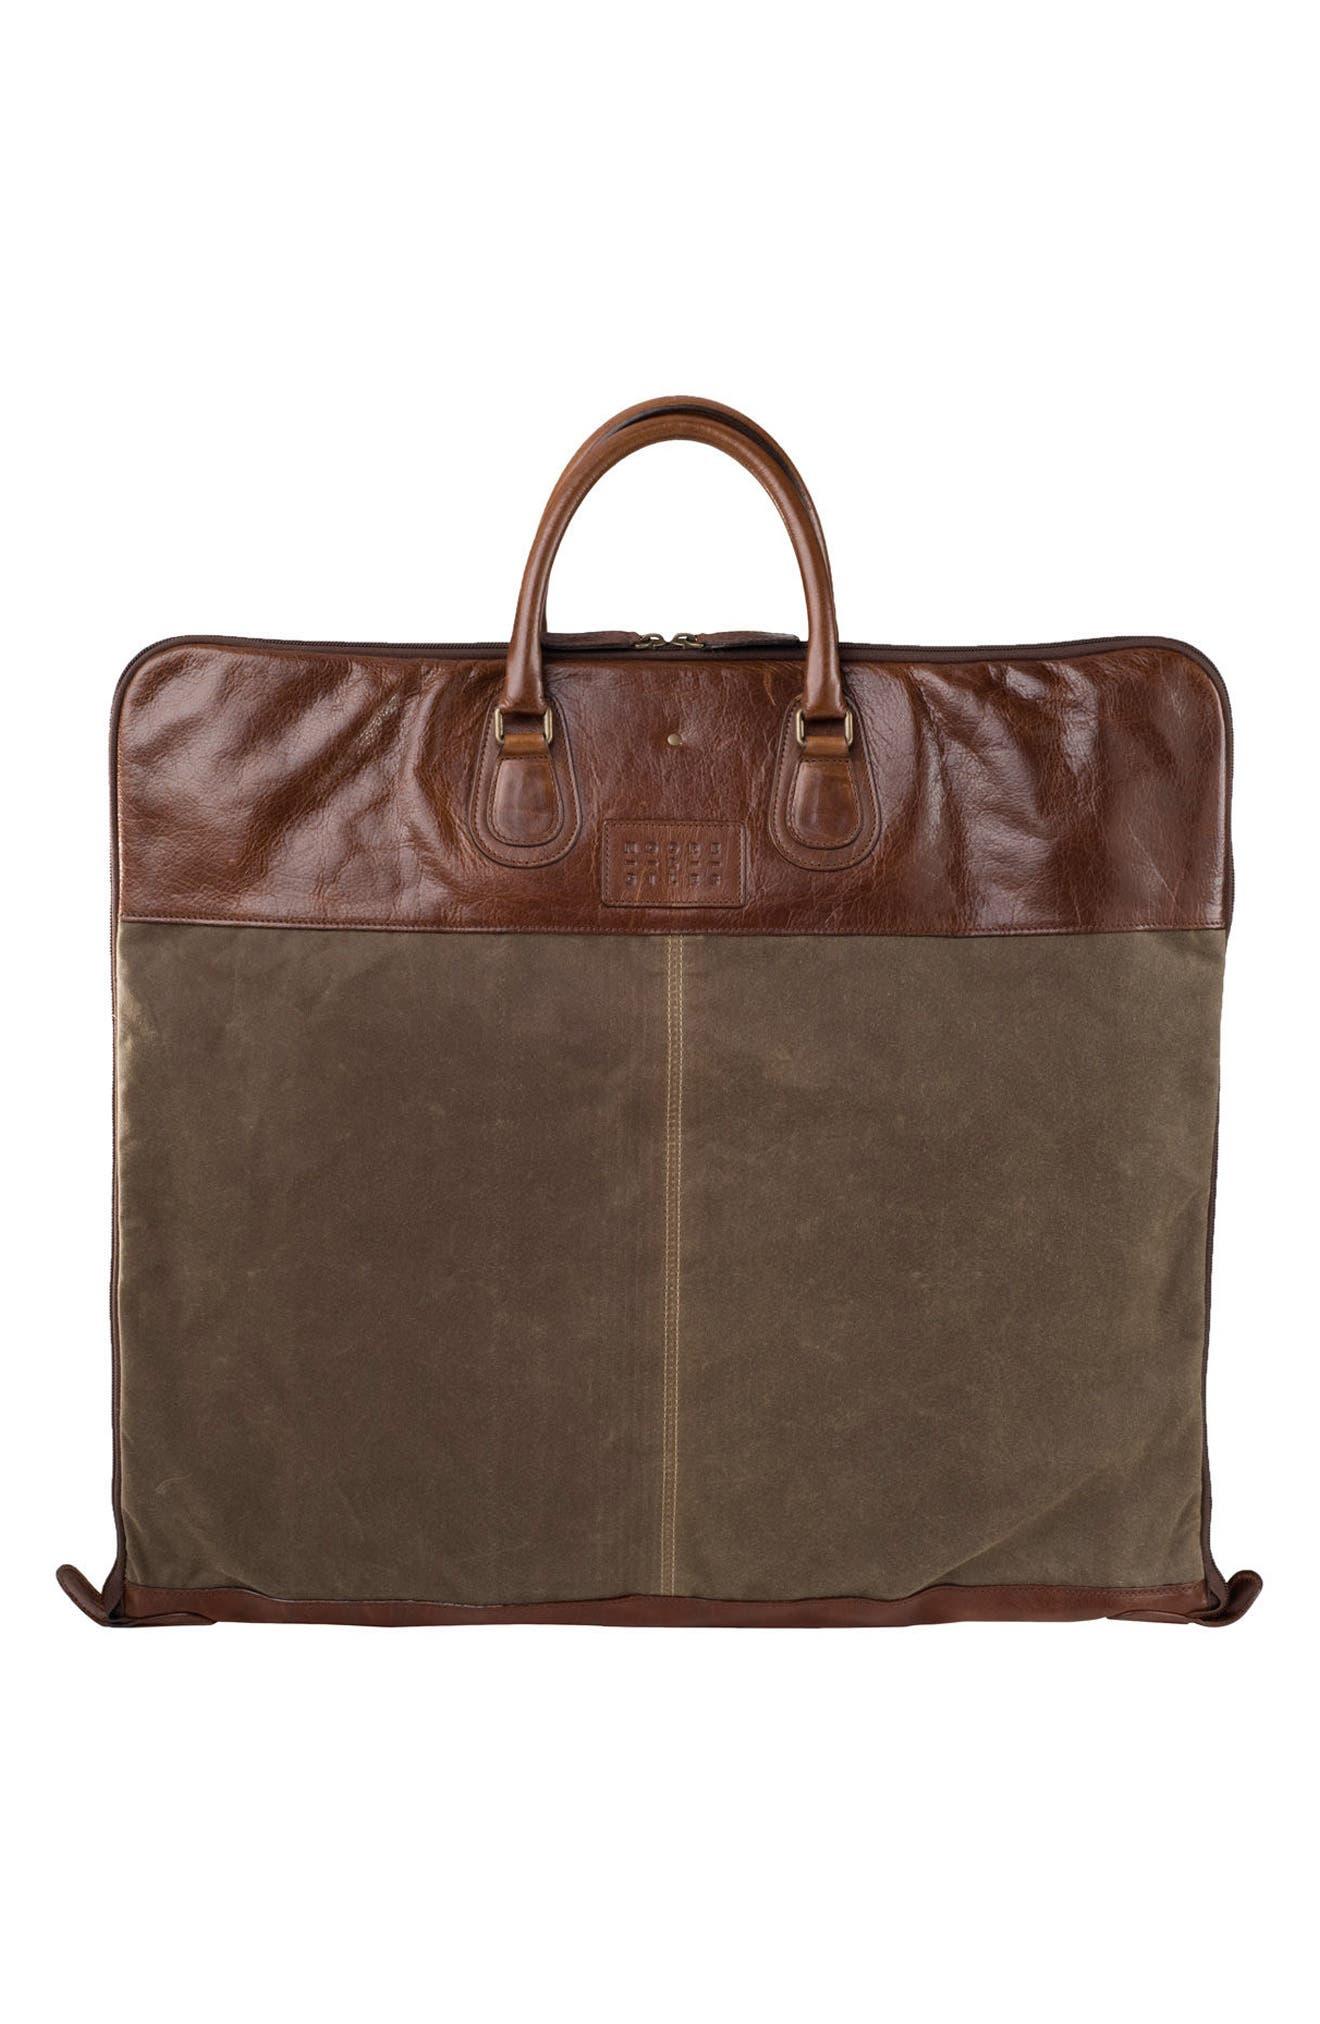 Gravely Garment Bag,                             Main thumbnail 1, color,                             WAXWEAR RANGERTAN